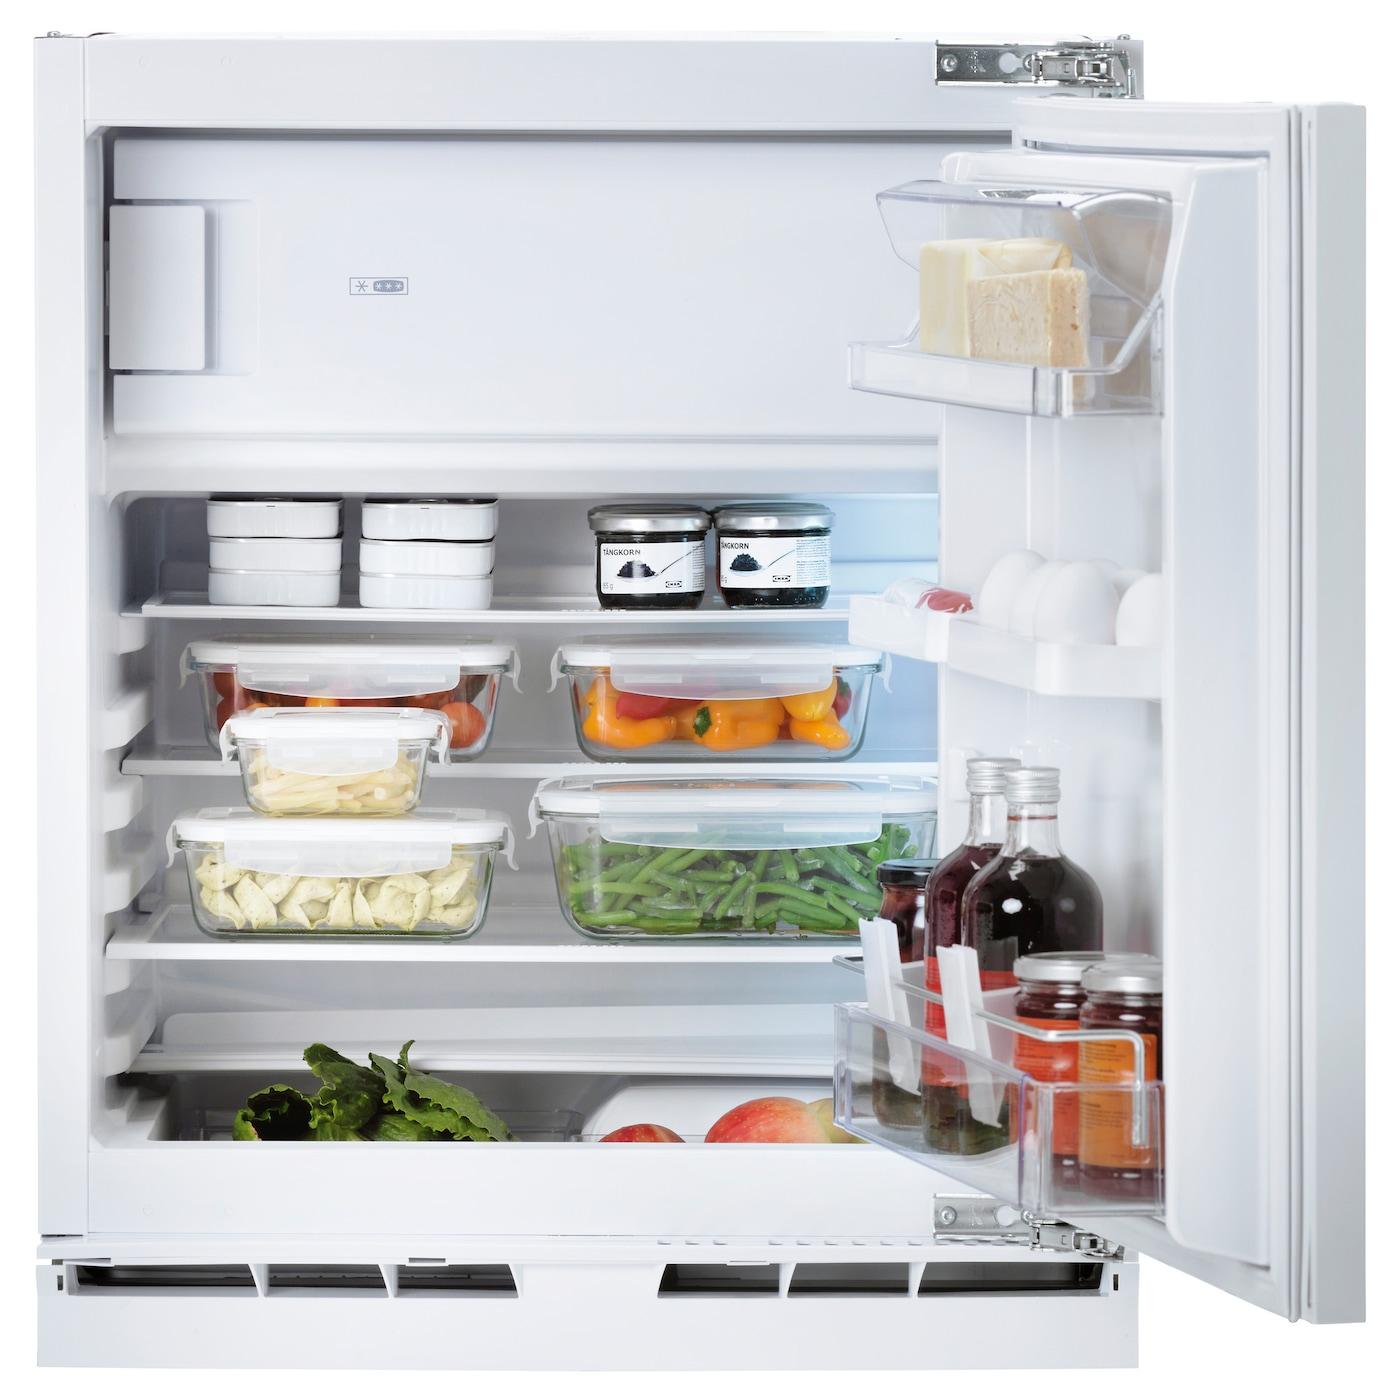 fridges freezers fridge freezers ikea. Black Bedroom Furniture Sets. Home Design Ideas